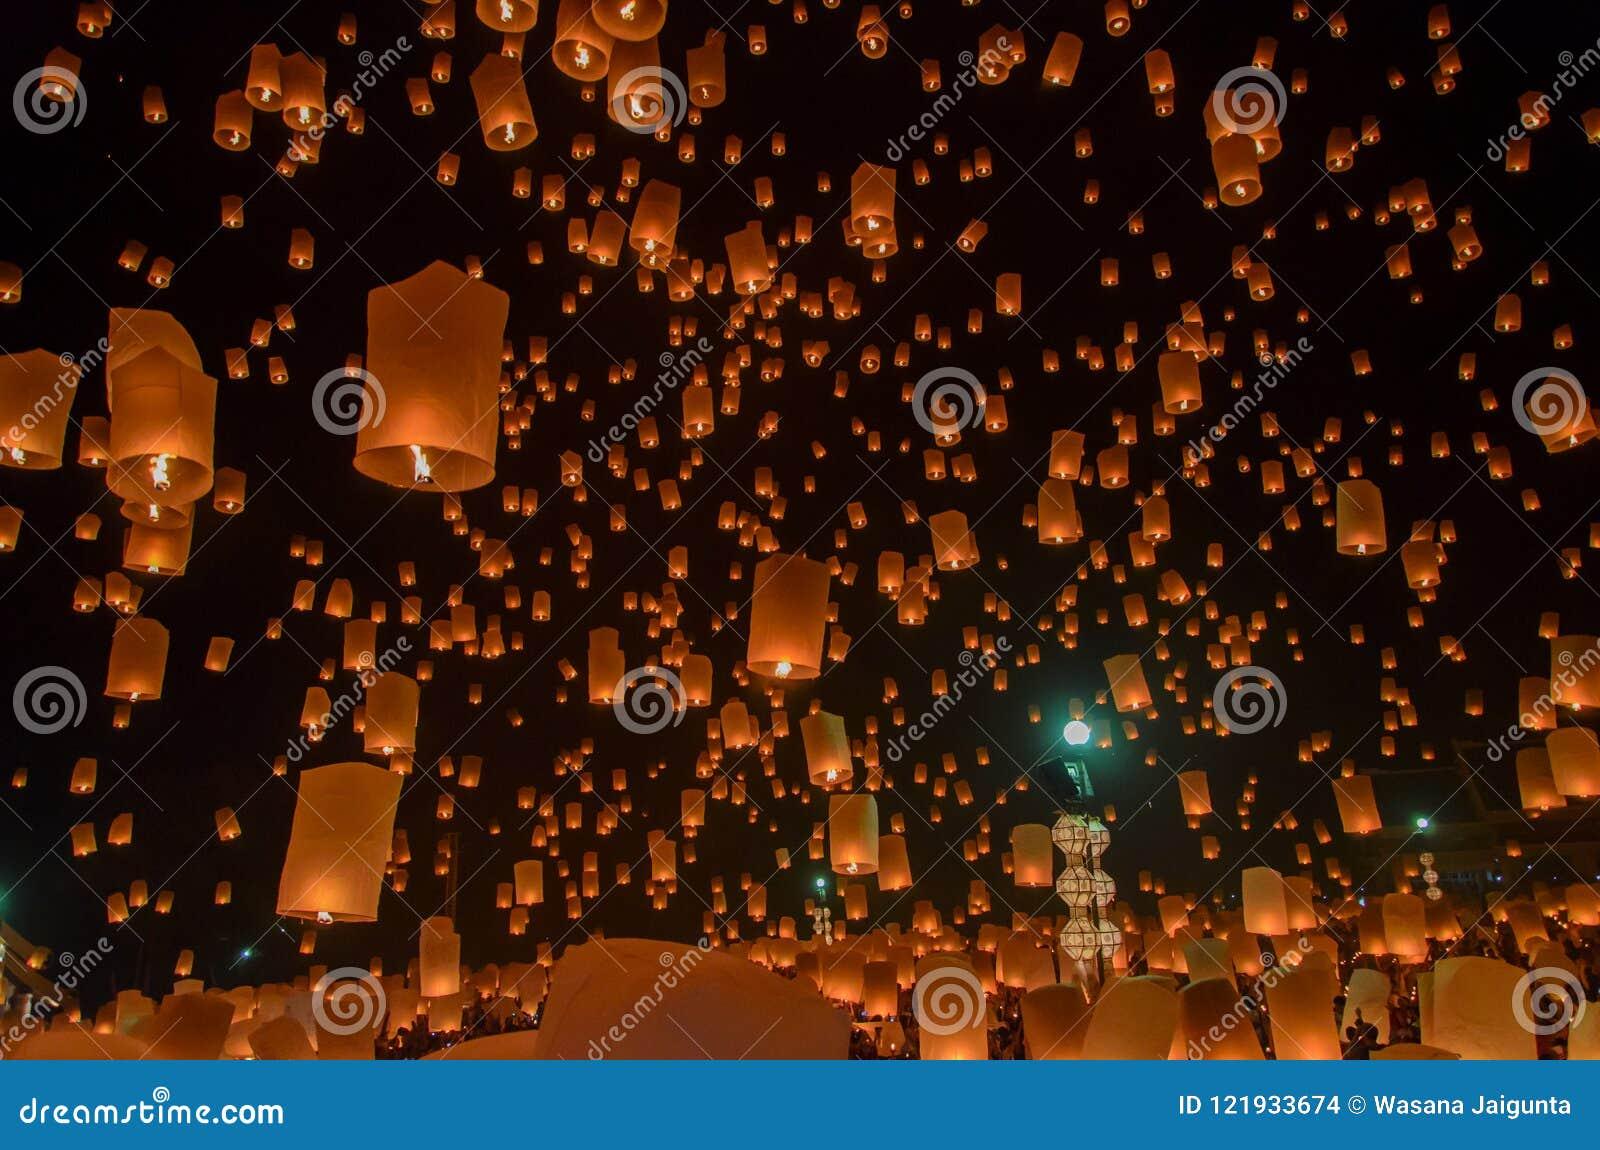 Floating Lanterns Or Balloon On The Sky Background Stock Photo Image Of Background Native 121933674